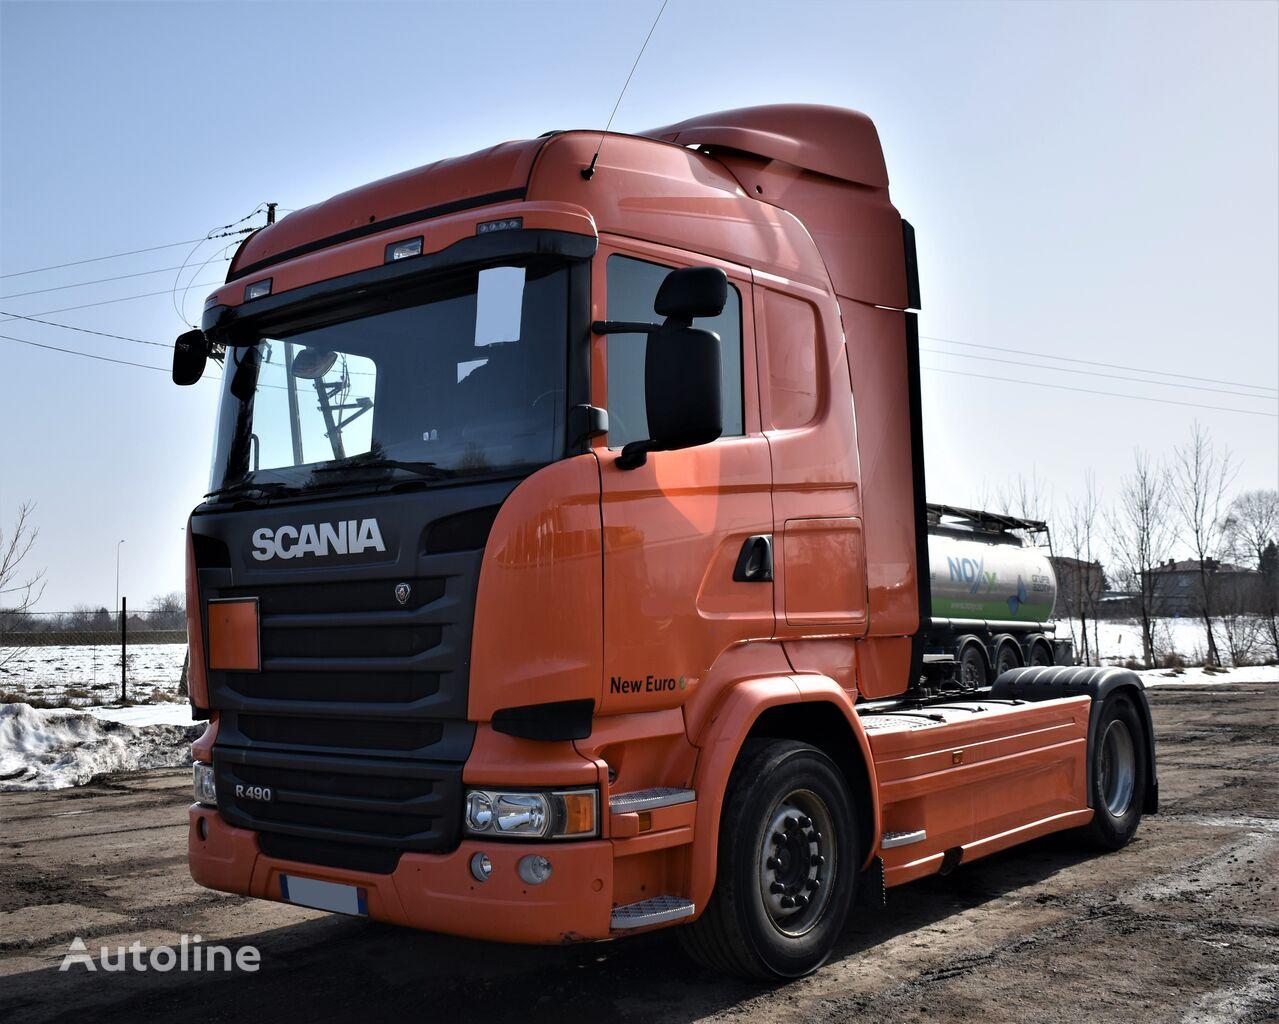 SCANIA R490 tractor unit